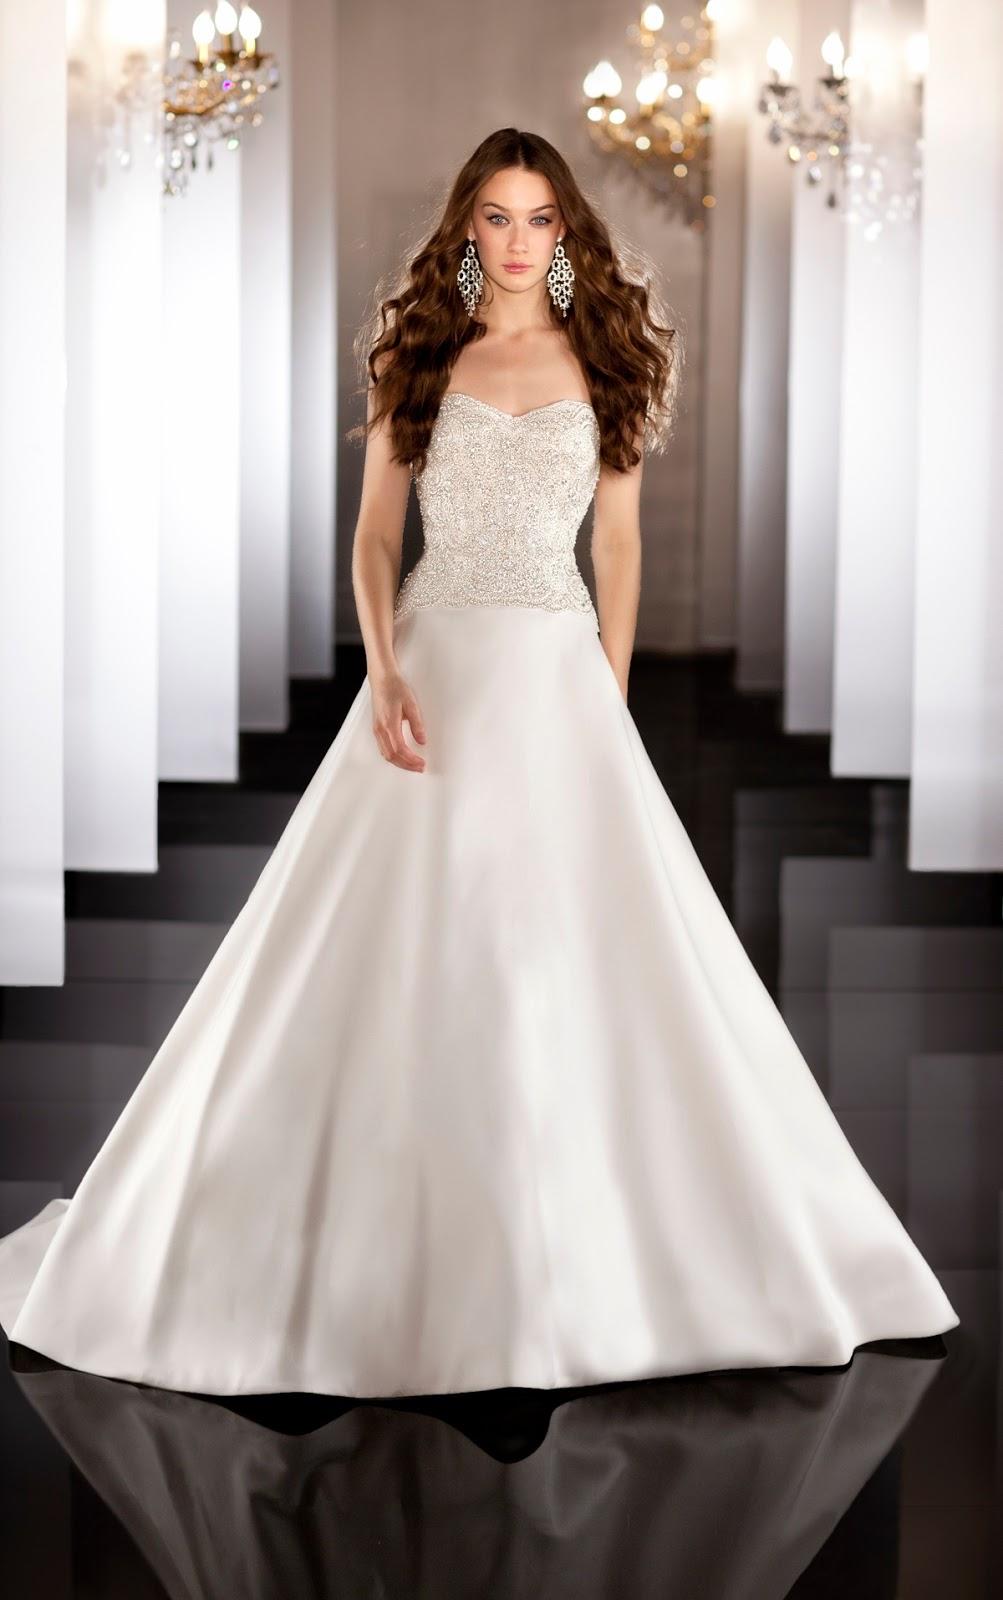 Martina Liana Bridal 2013 Spring Wedding Dresses - World of Bridal